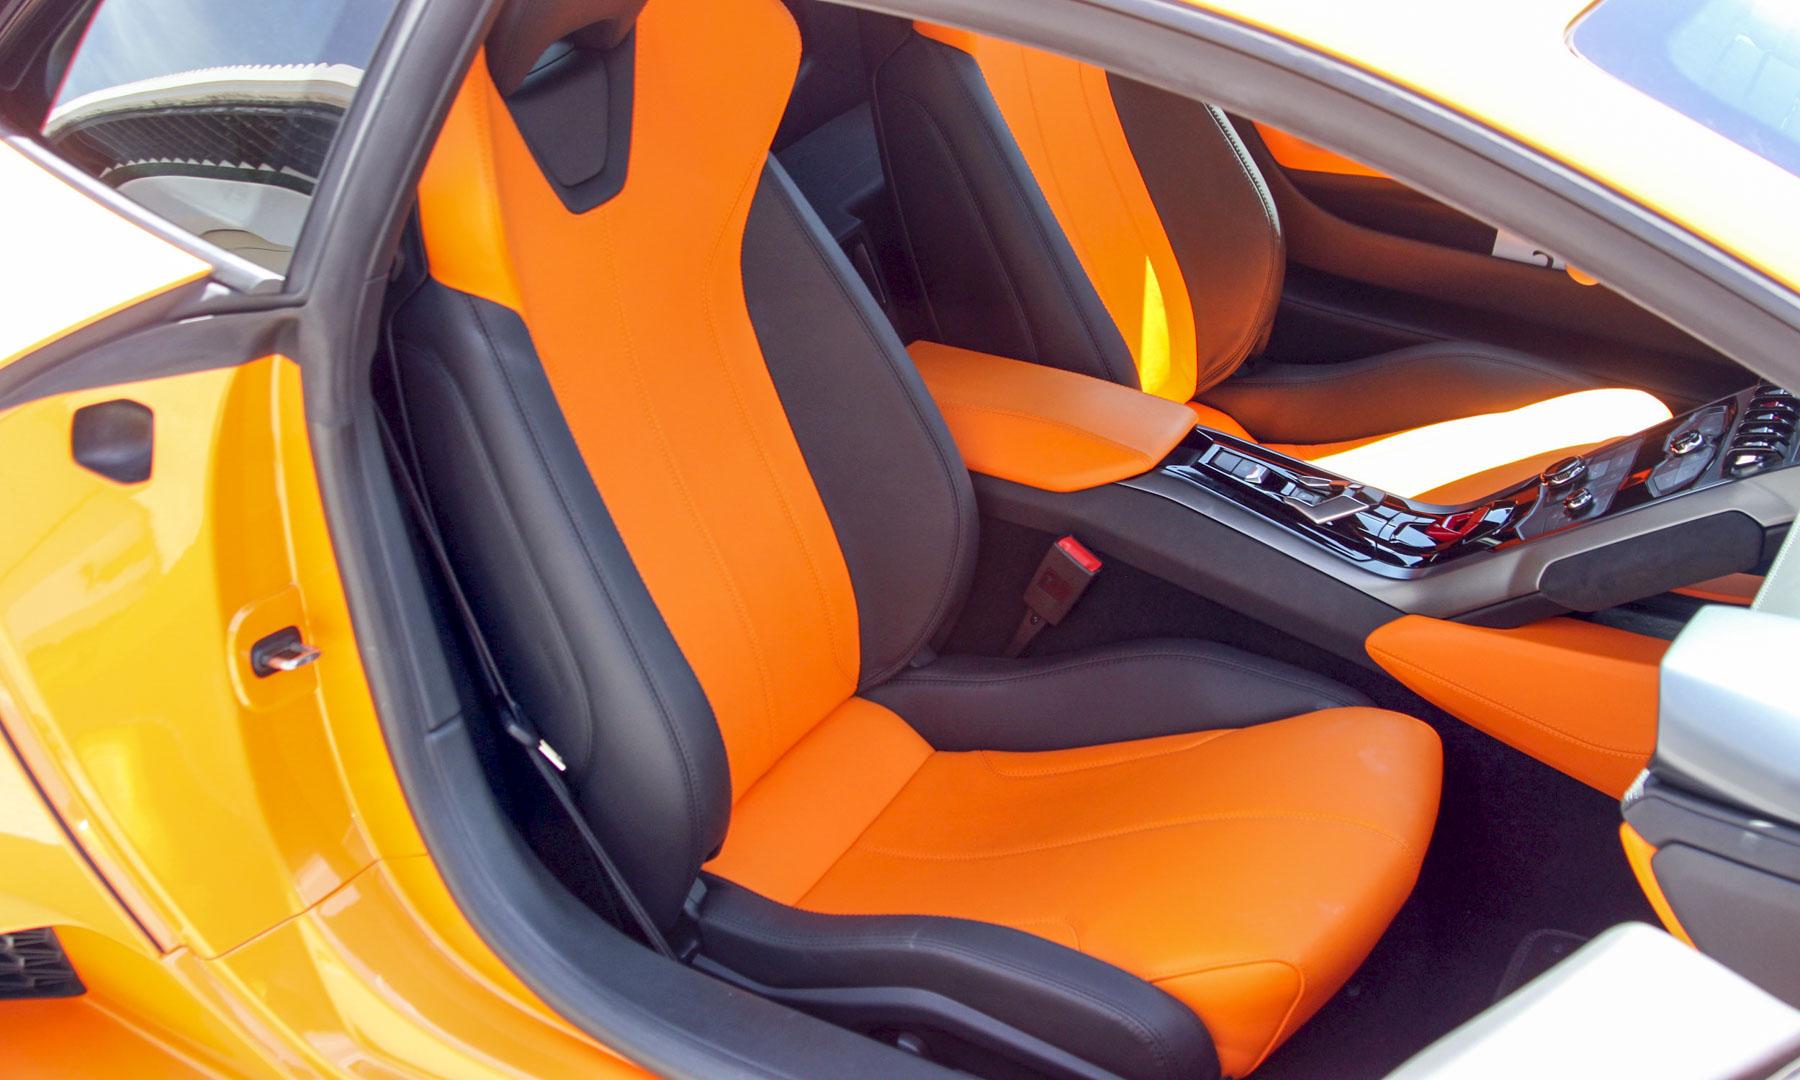 huracan interior orange. perry stern huracan interior orange r